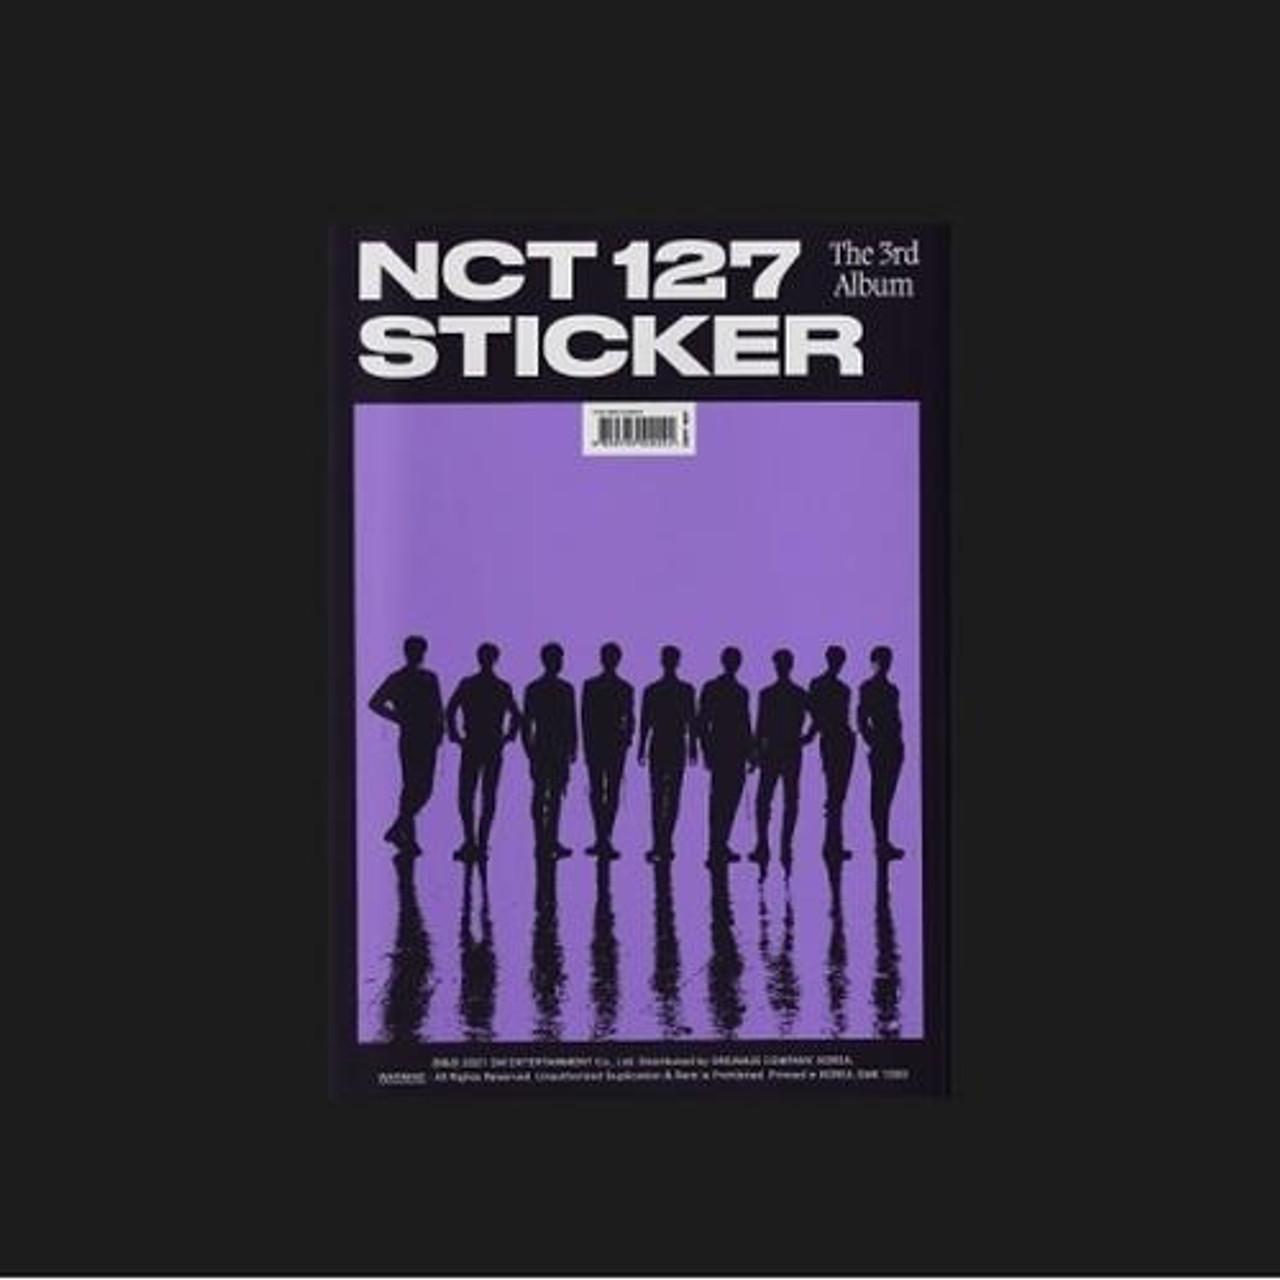 NCT 127 - Vol.3 [Sticker] PhotoBook Ver.